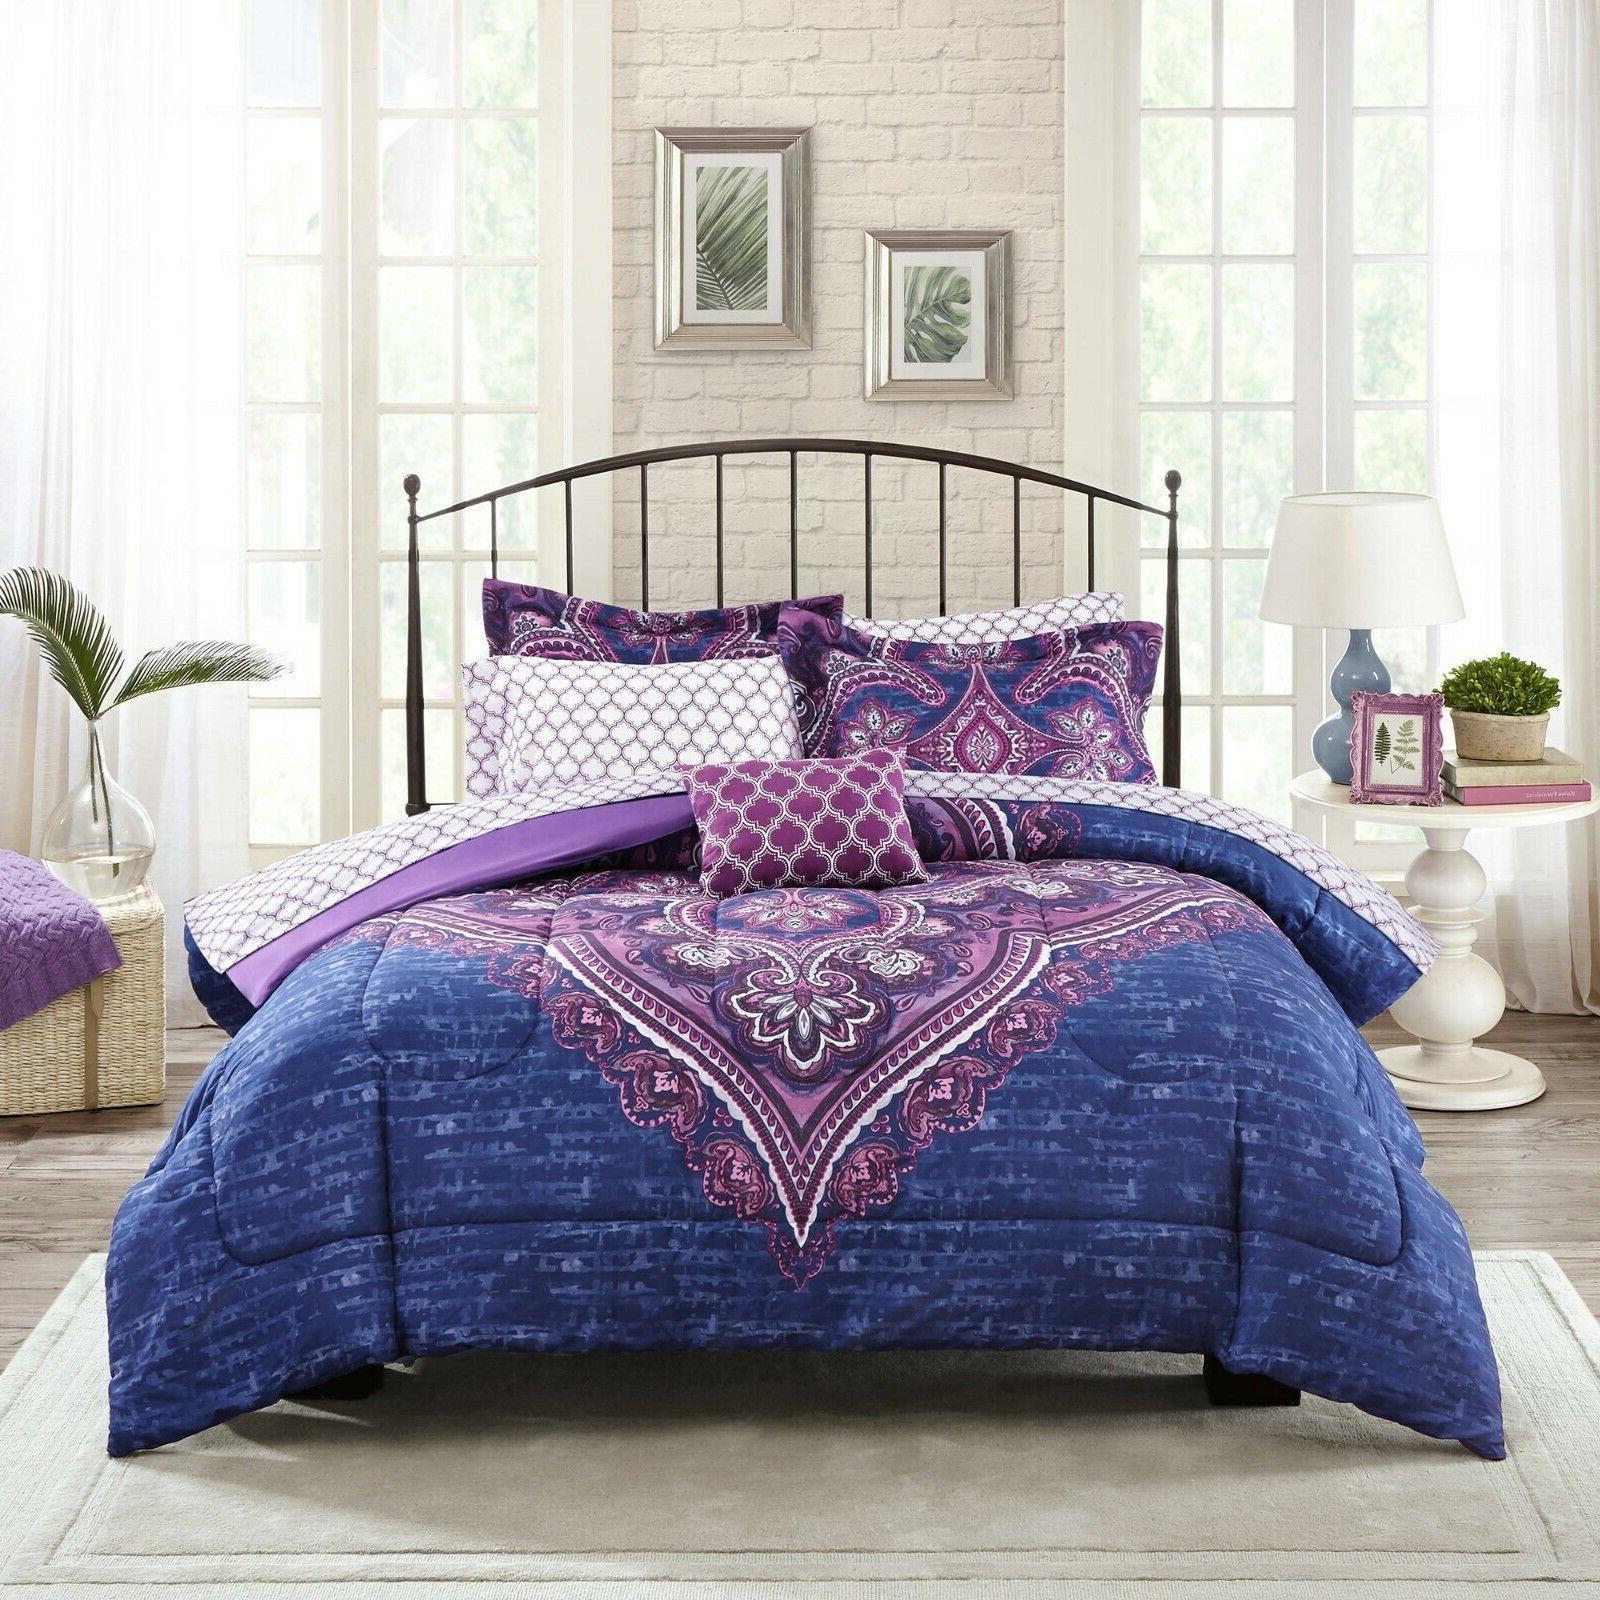 King Bedding Set Sheets 8 Girl Comfort Purple